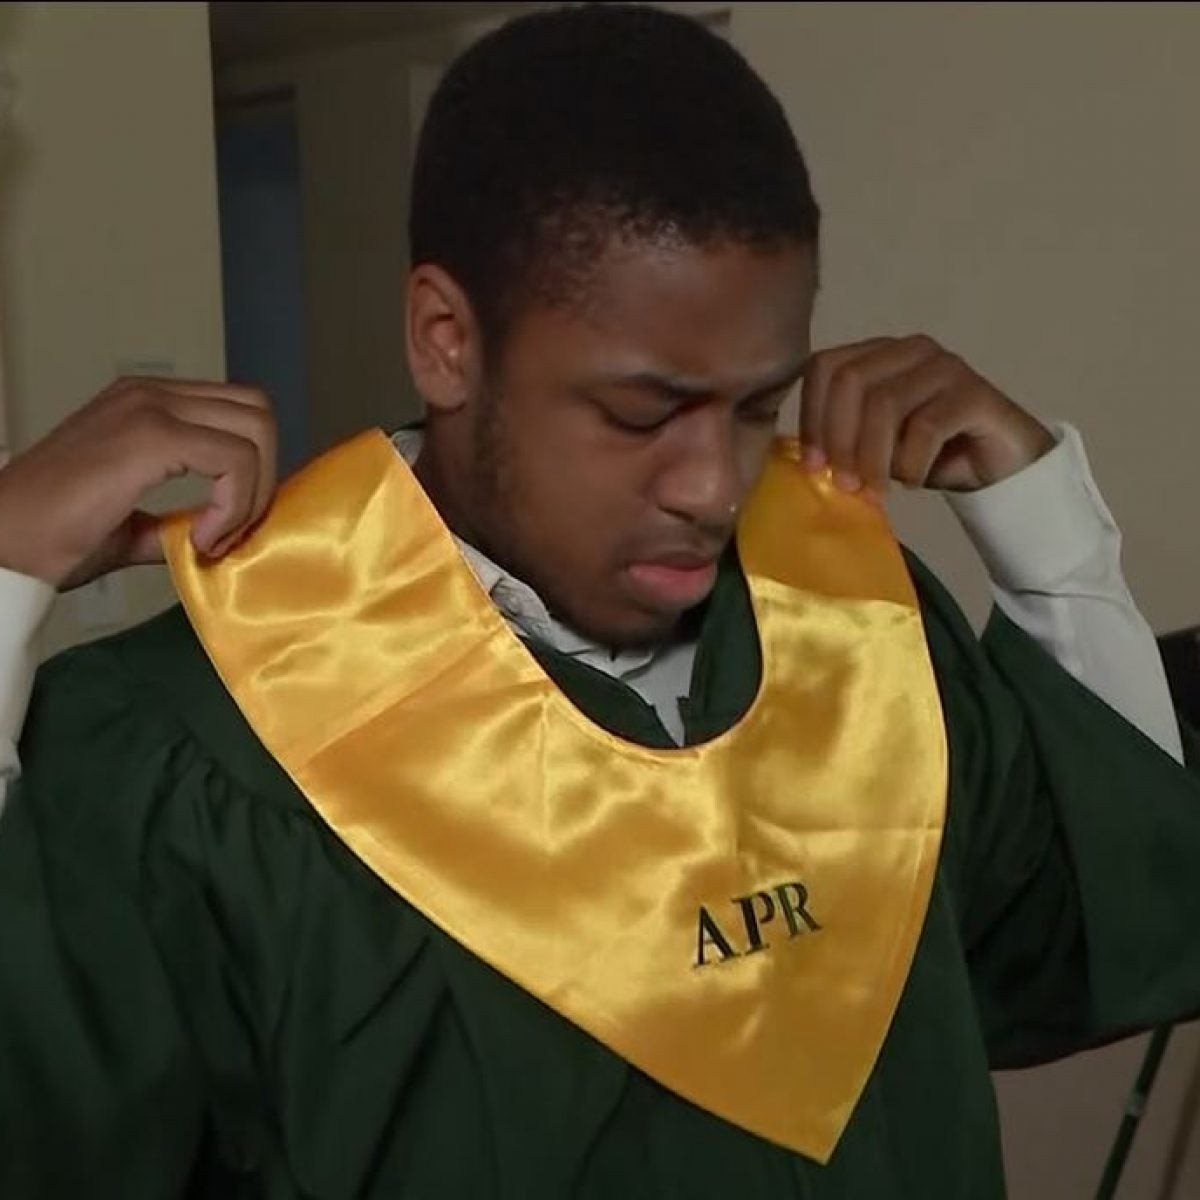 Jacksonville Teen Becomes Class Valedictorian Despite Experiencing Homelessness